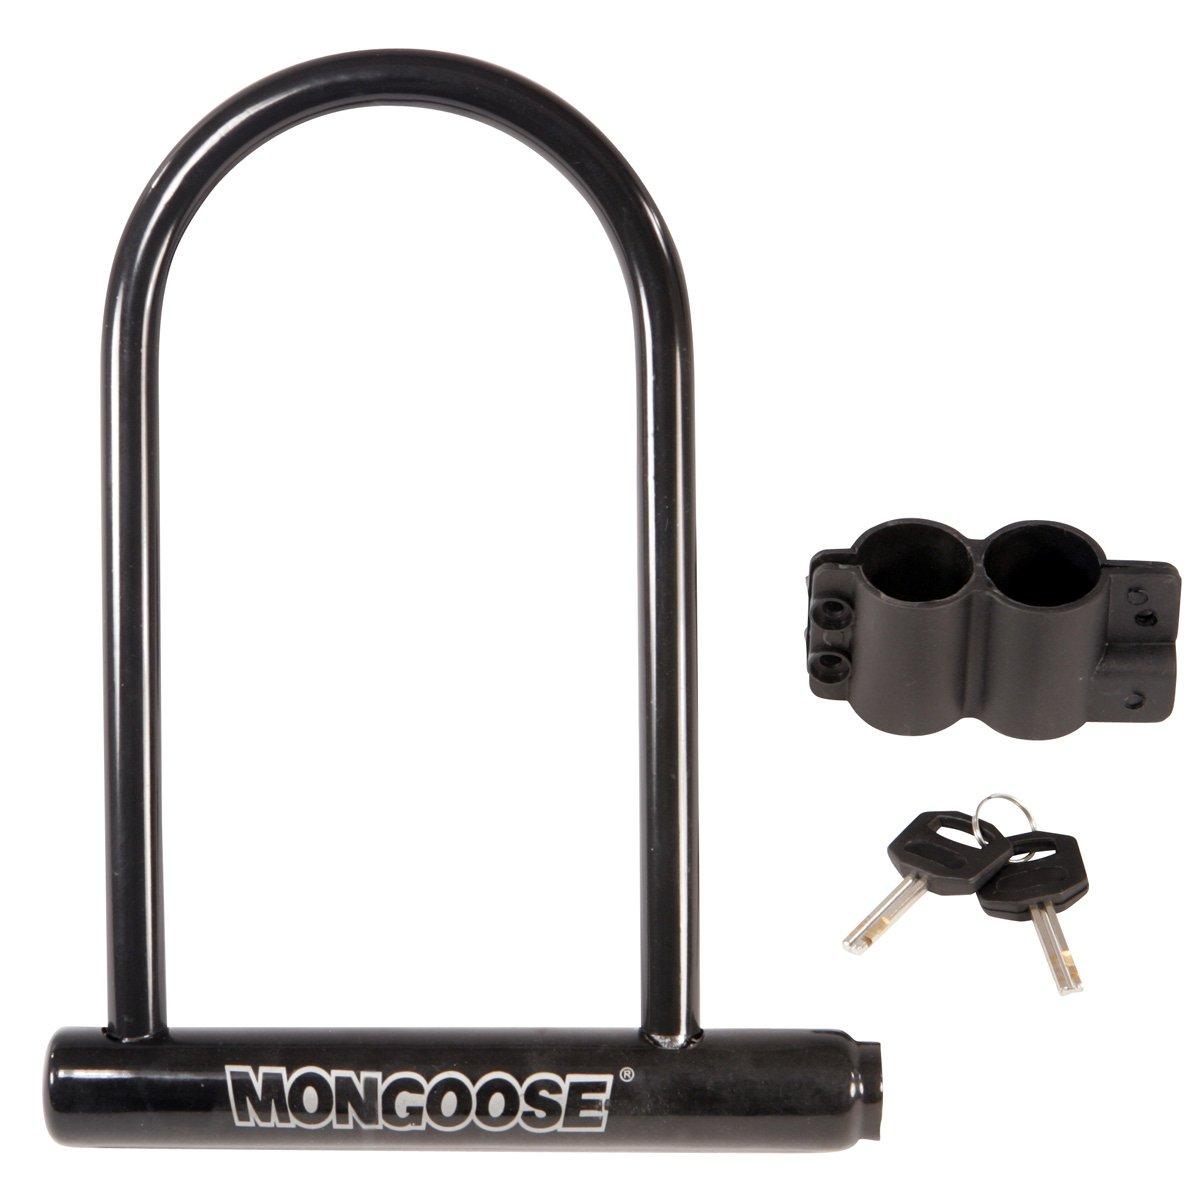 mongoose large bicycle u lock ebay. Black Bedroom Furniture Sets. Home Design Ideas